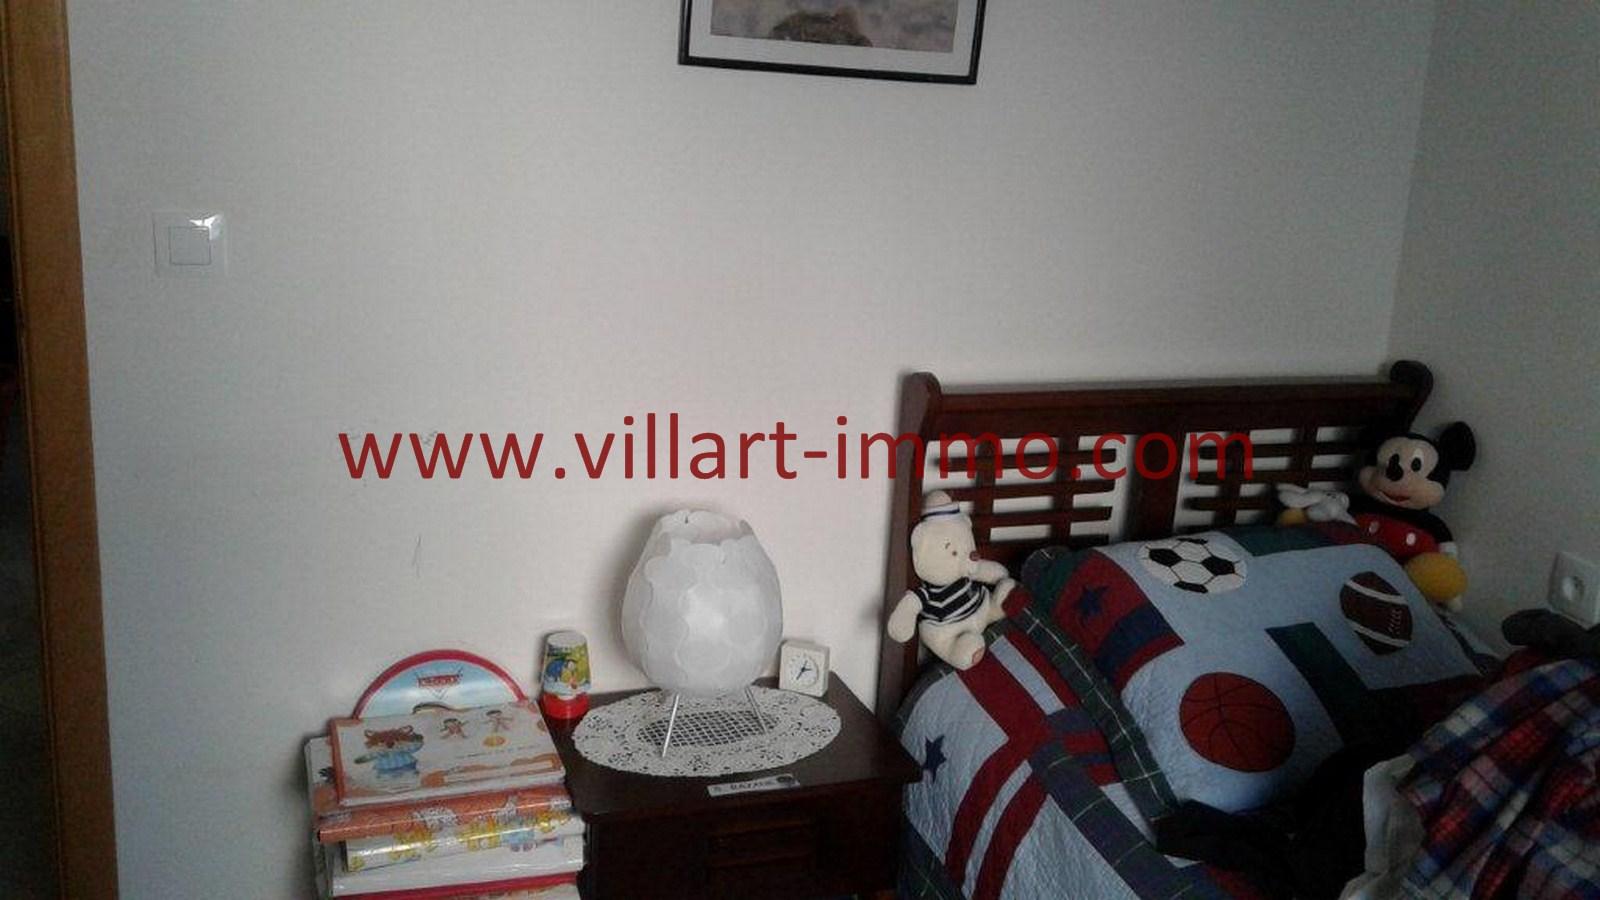 3-A vendre-Appartement-Tanger-Castilla-Chambre 2-VA473-Villart immo-Agence Immobilière